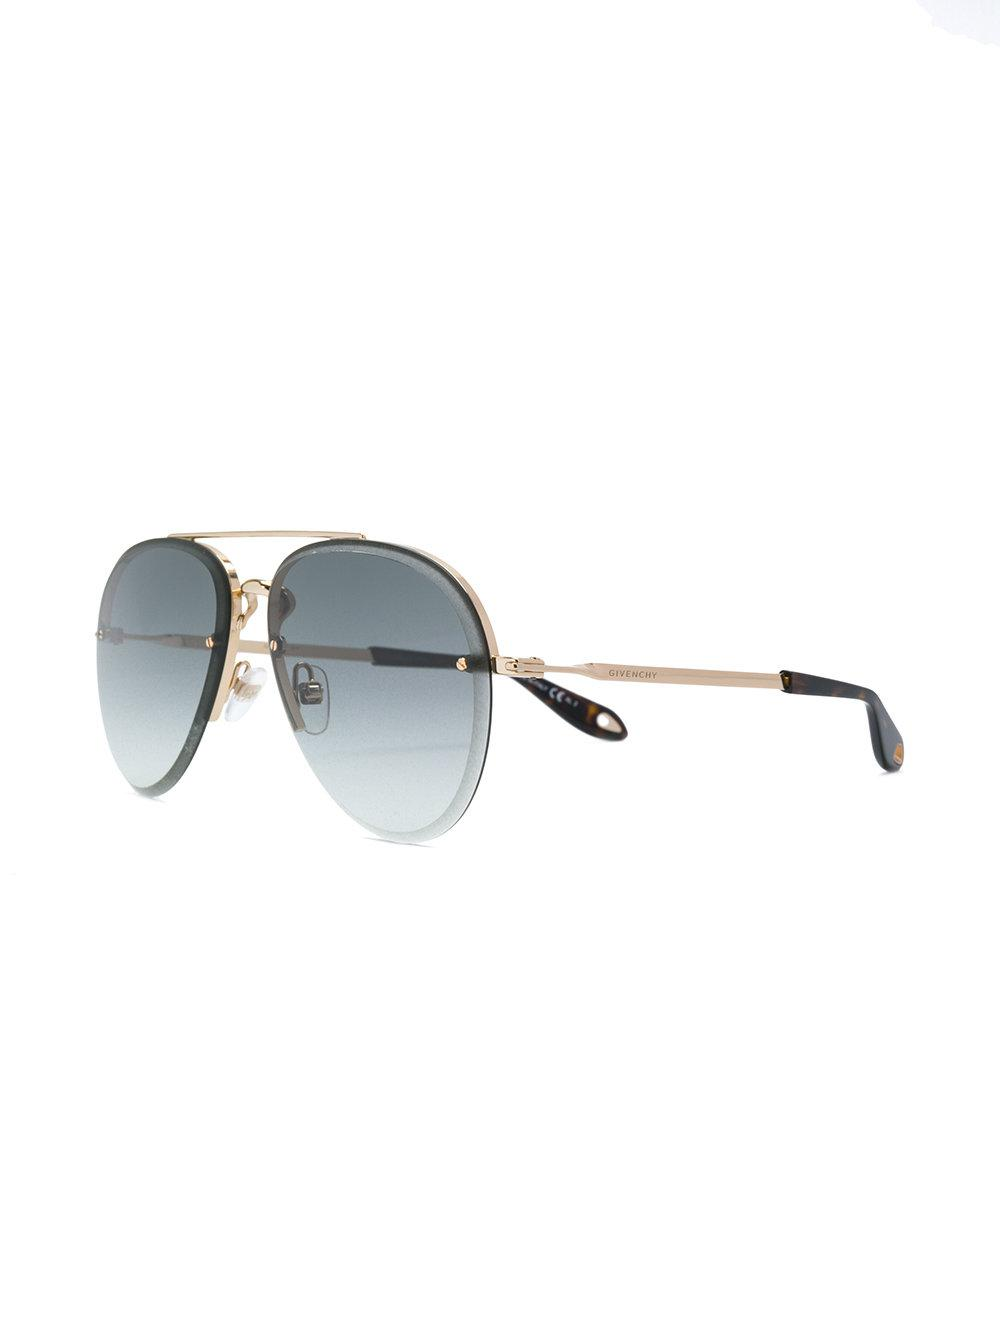 cb3ed90febc Lyst - Givenchy Gv 707 Palladium Sunglasses in Metallic for Men